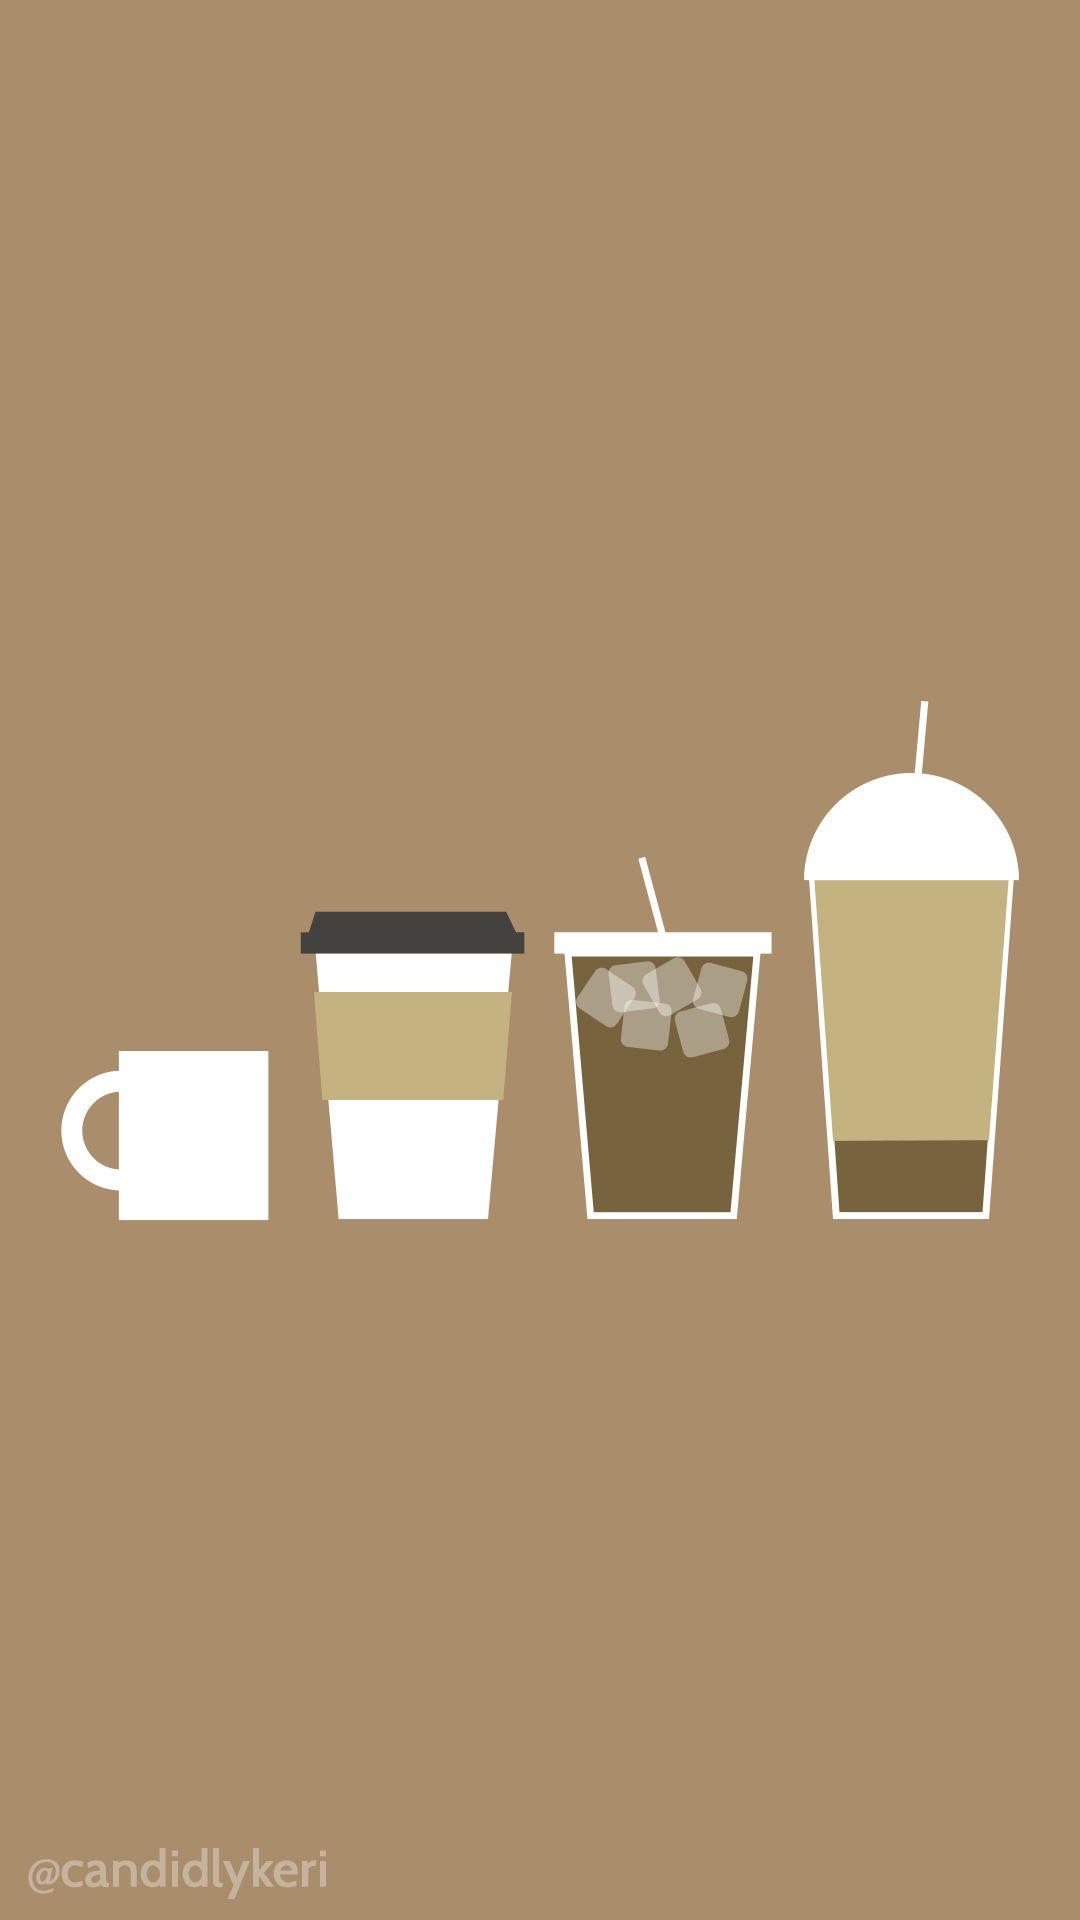 Cute cartoon coffee, latte, iced coffee wallpaper you can